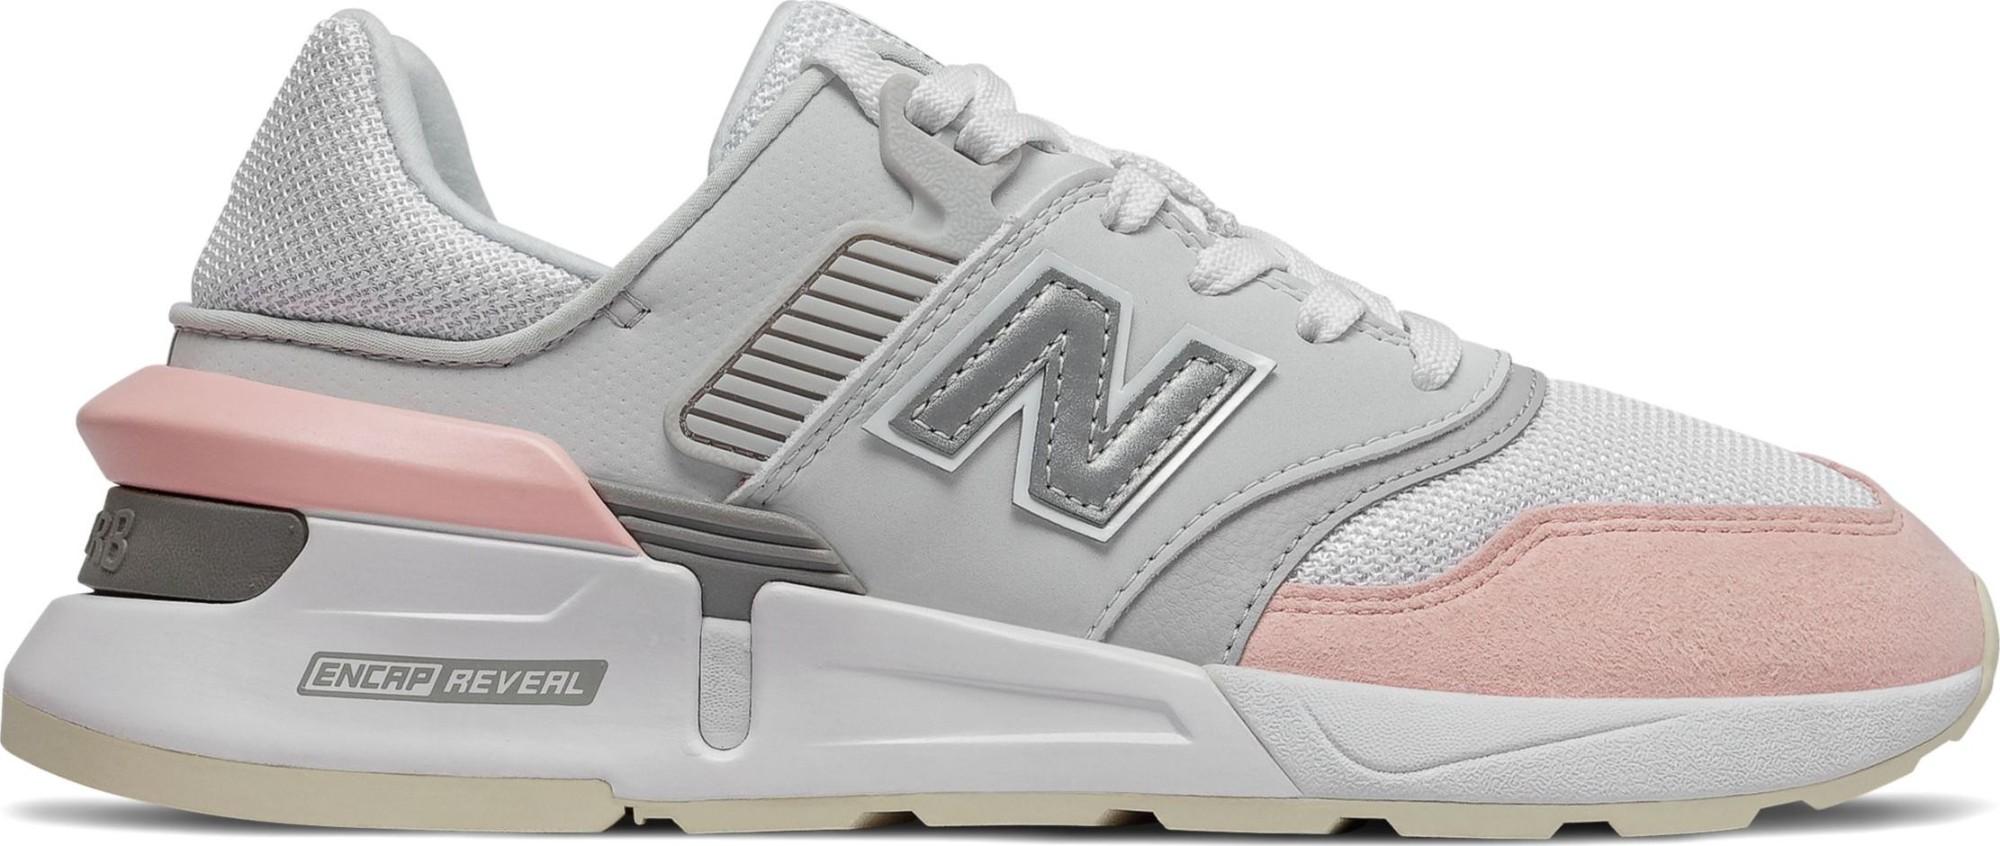 New Balance WS997 Sport White 40